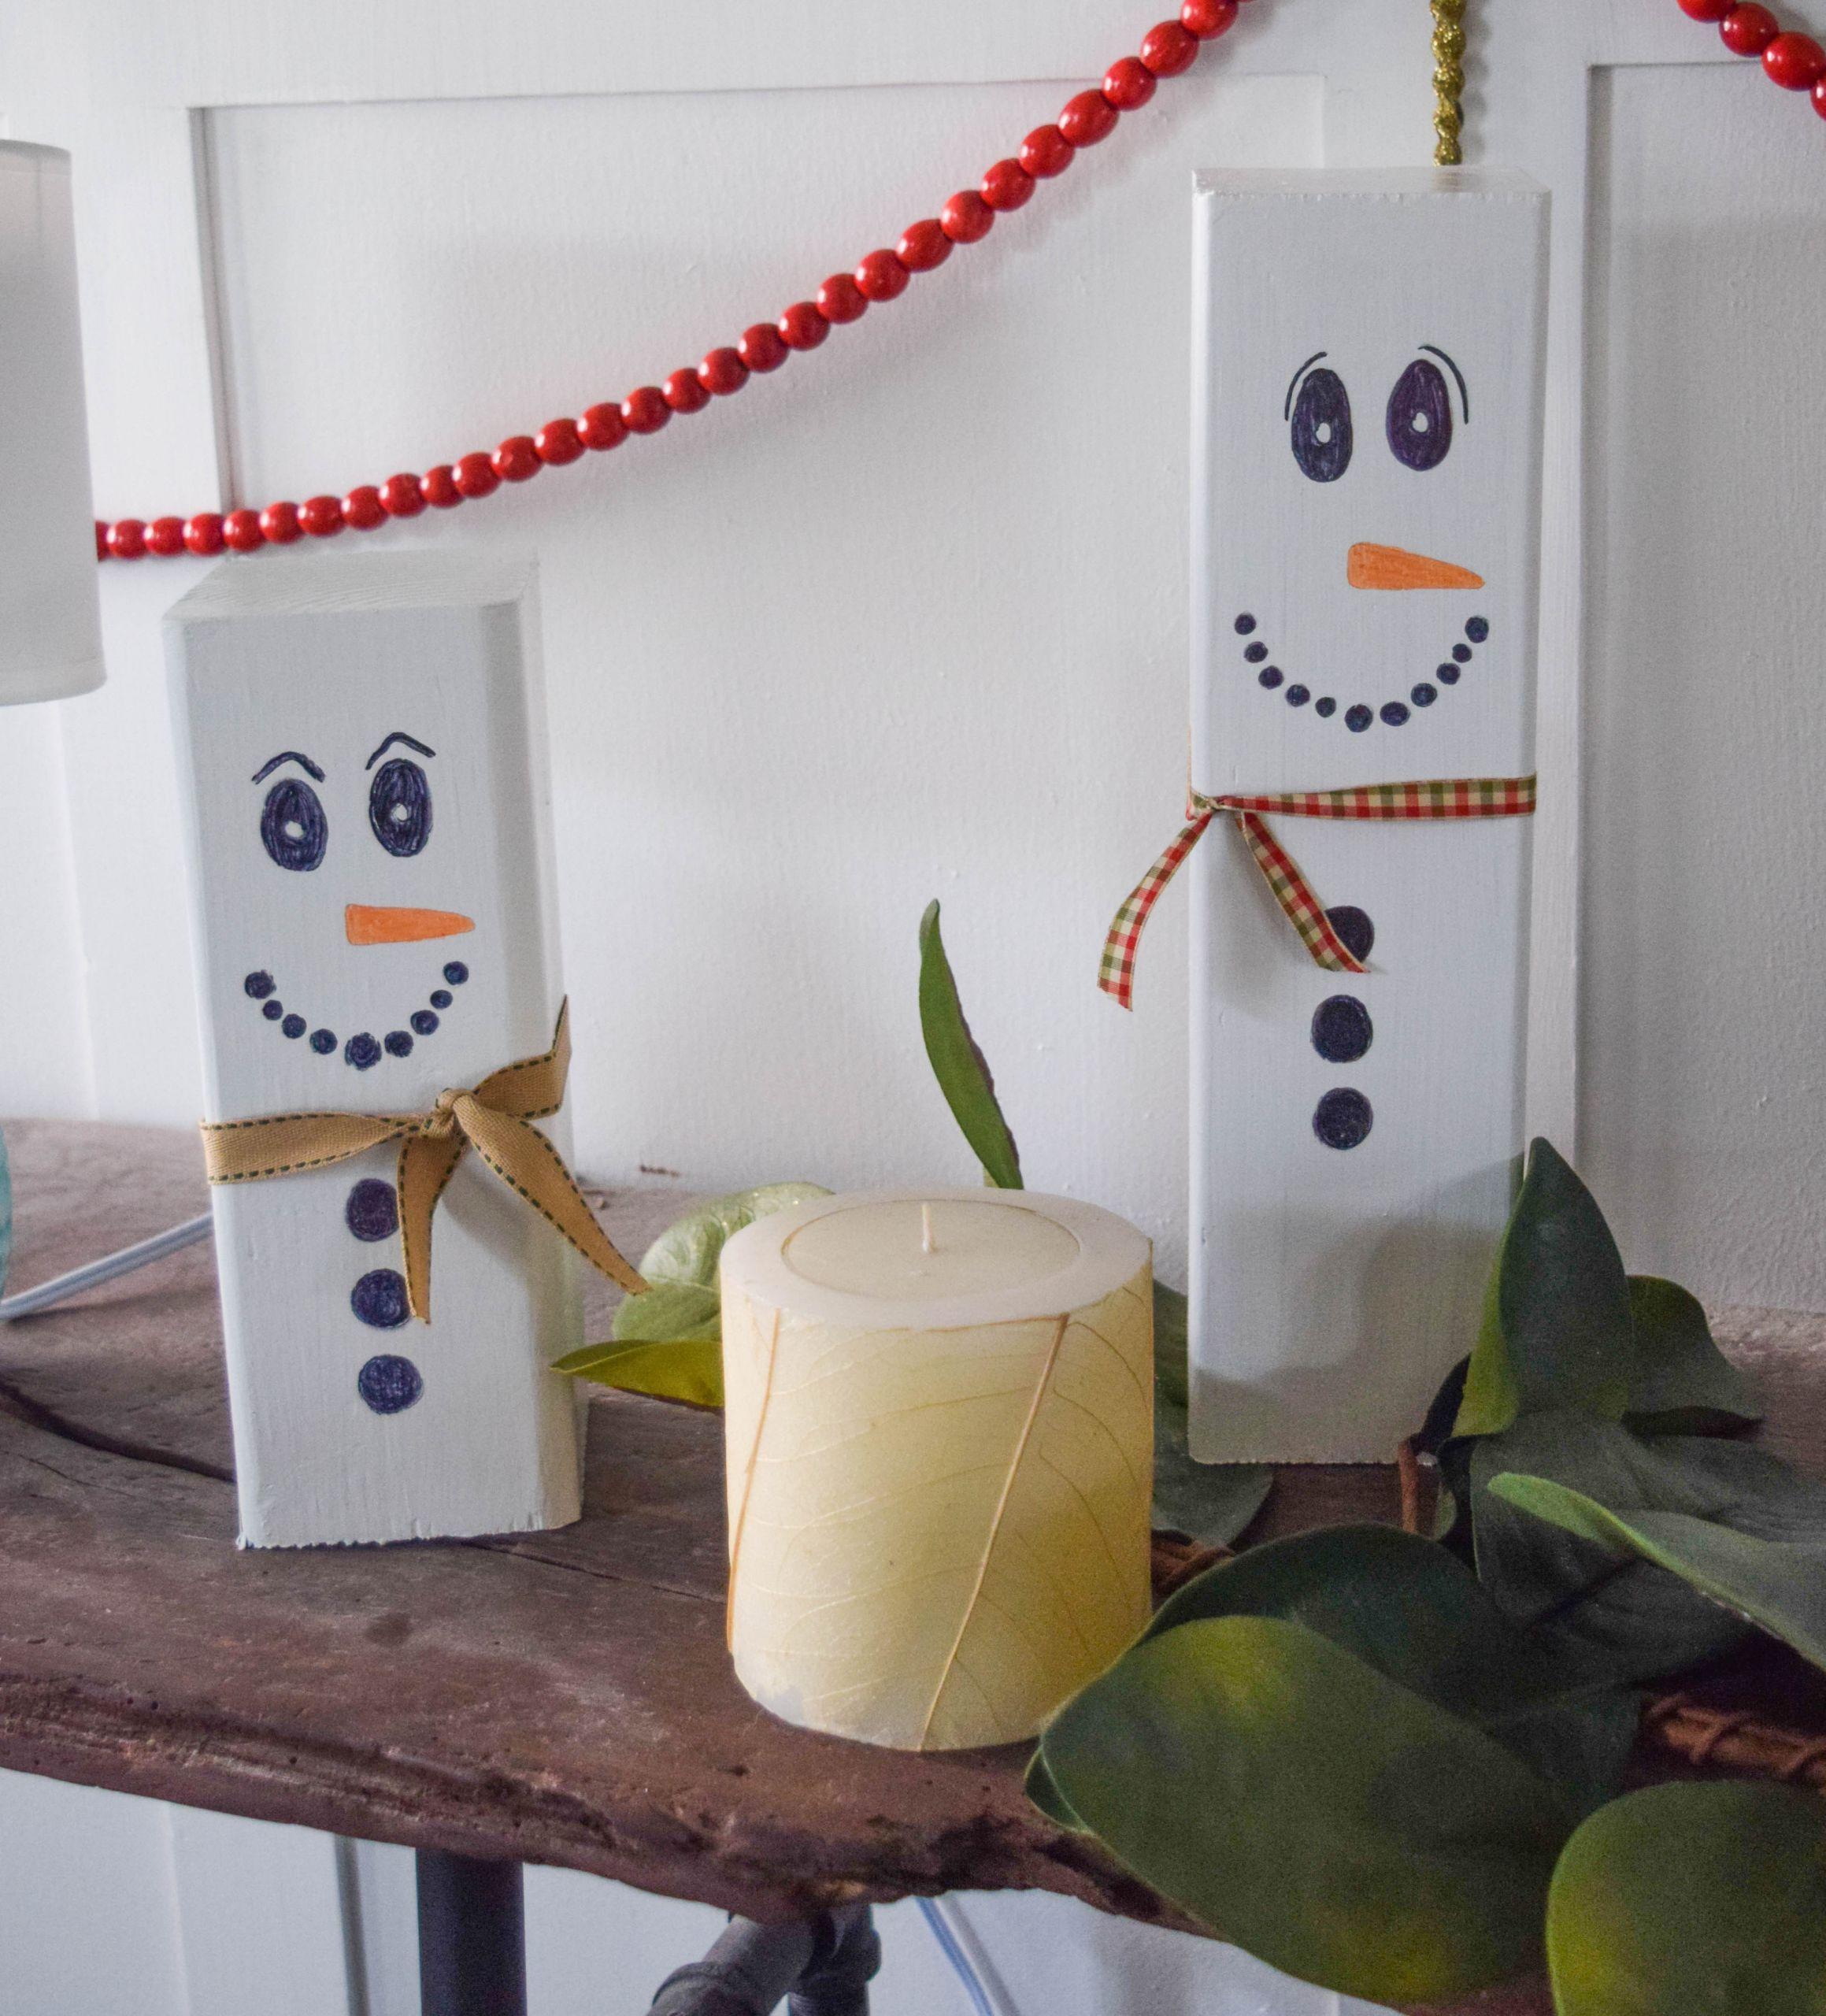 DIY Wooden Snowman  Wooden snowman craft easy Christmas decoration idea • Our